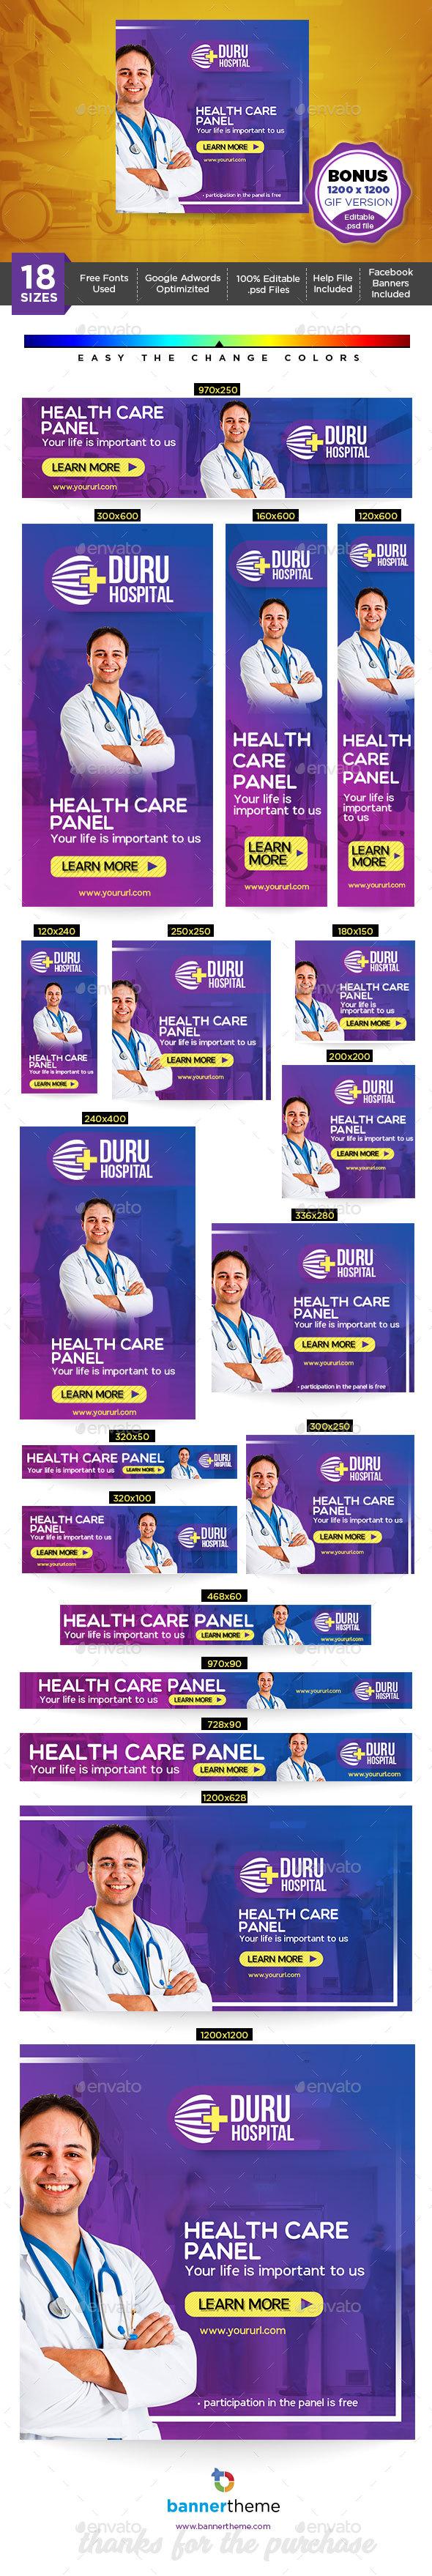 GraphicRiver Hospital Banner 21109220